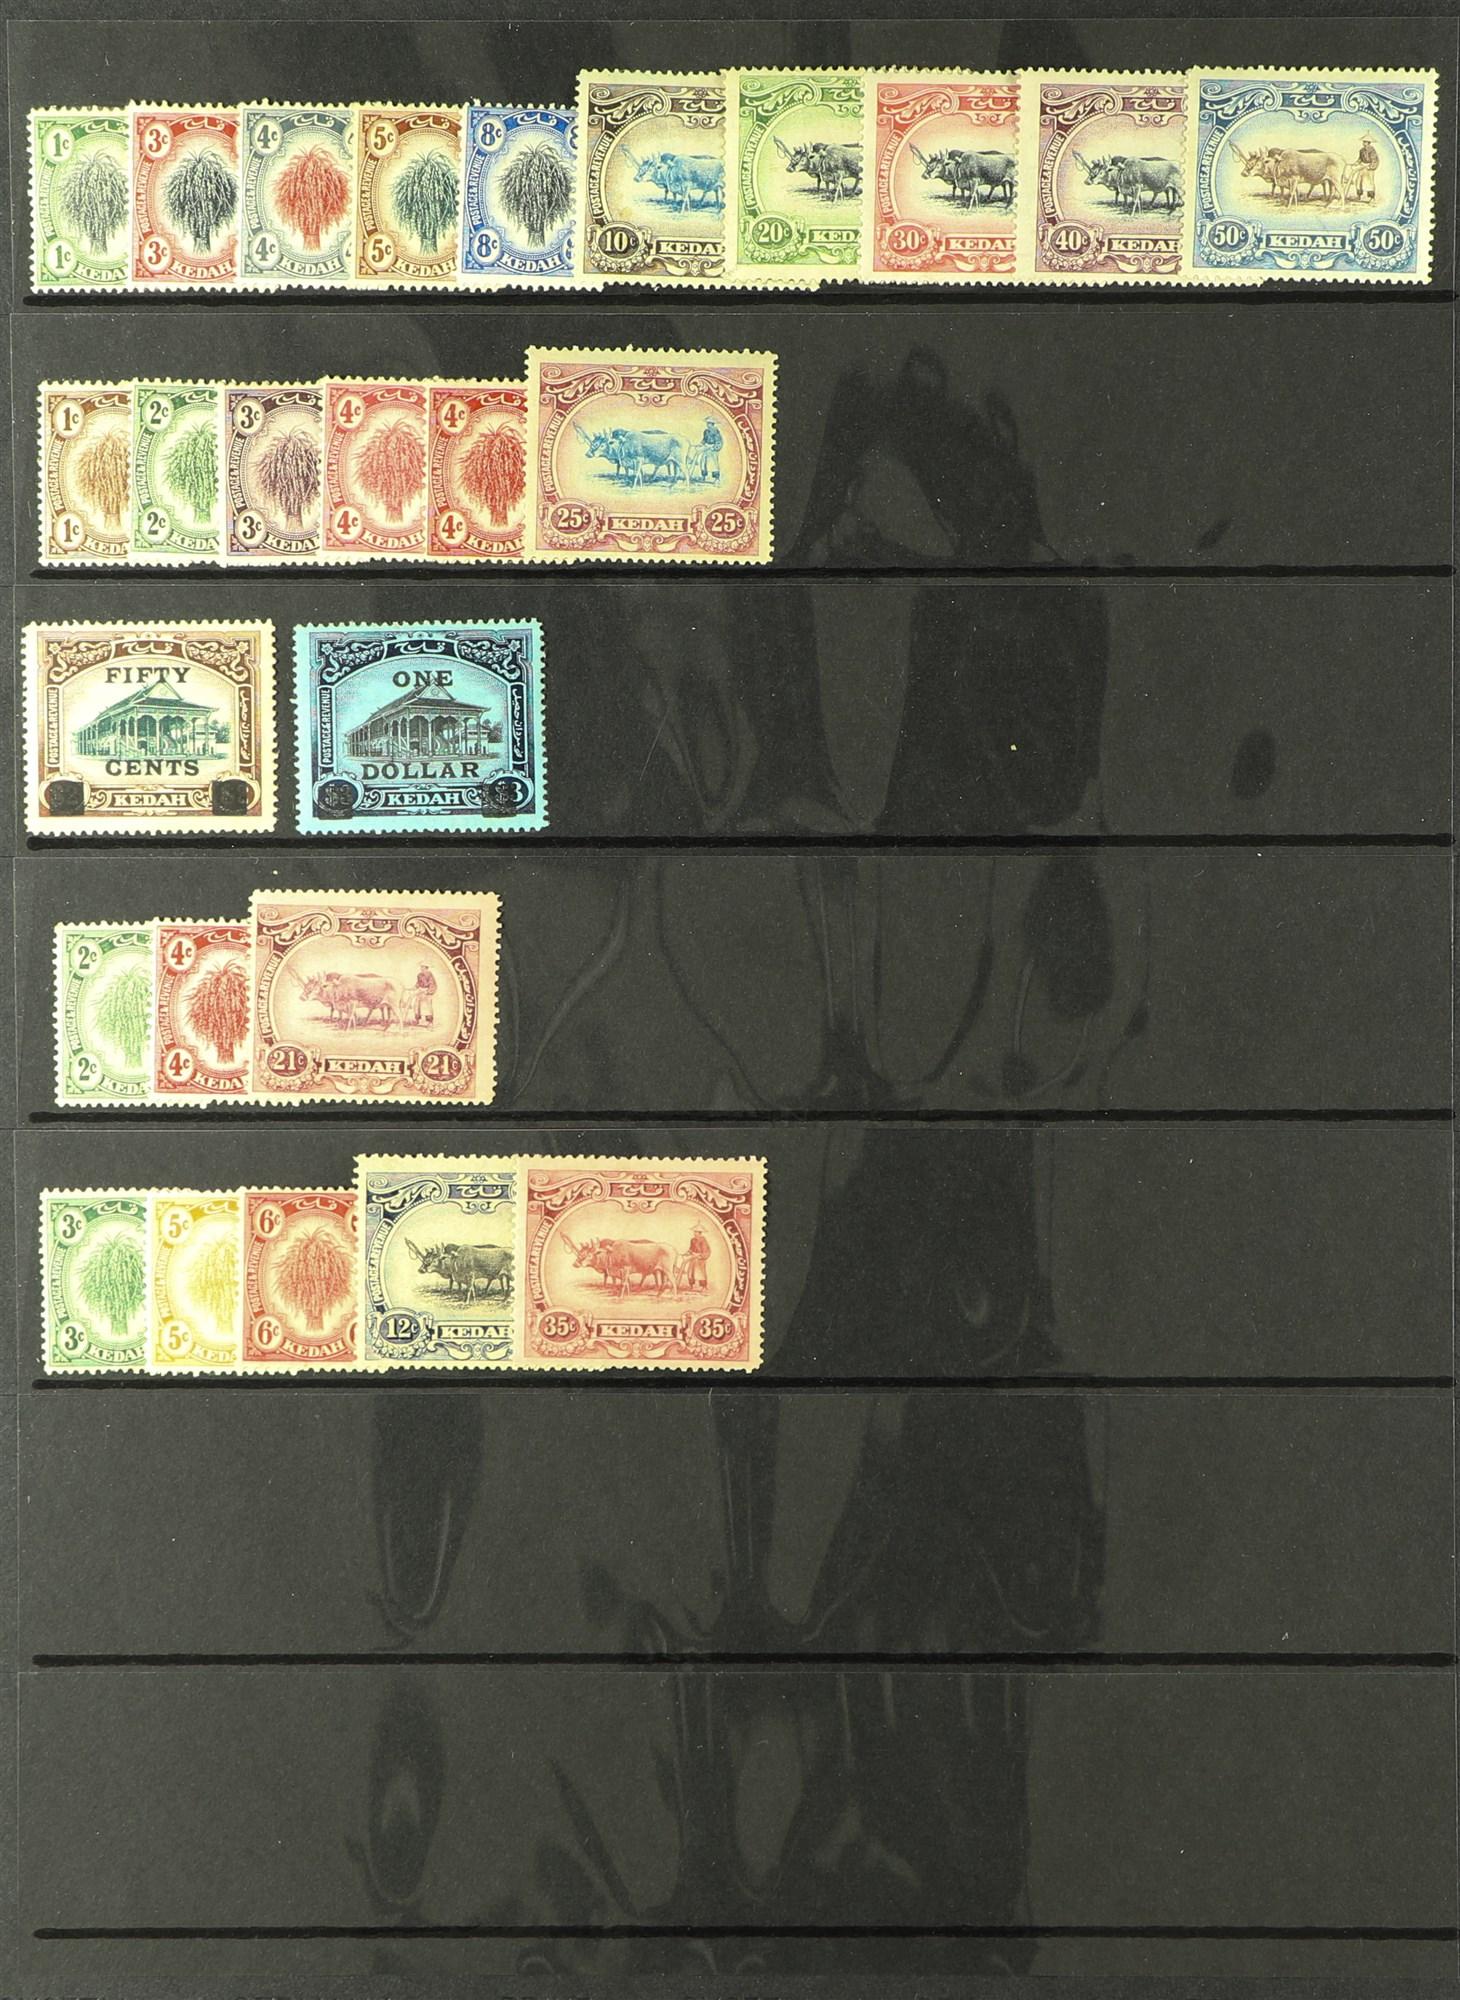 MALAYA STATES KEDAH 1912-26 mint incl. 1912 set to 50c, 1919-21 incl. both 4c, 1919 50c on $2 (heavy